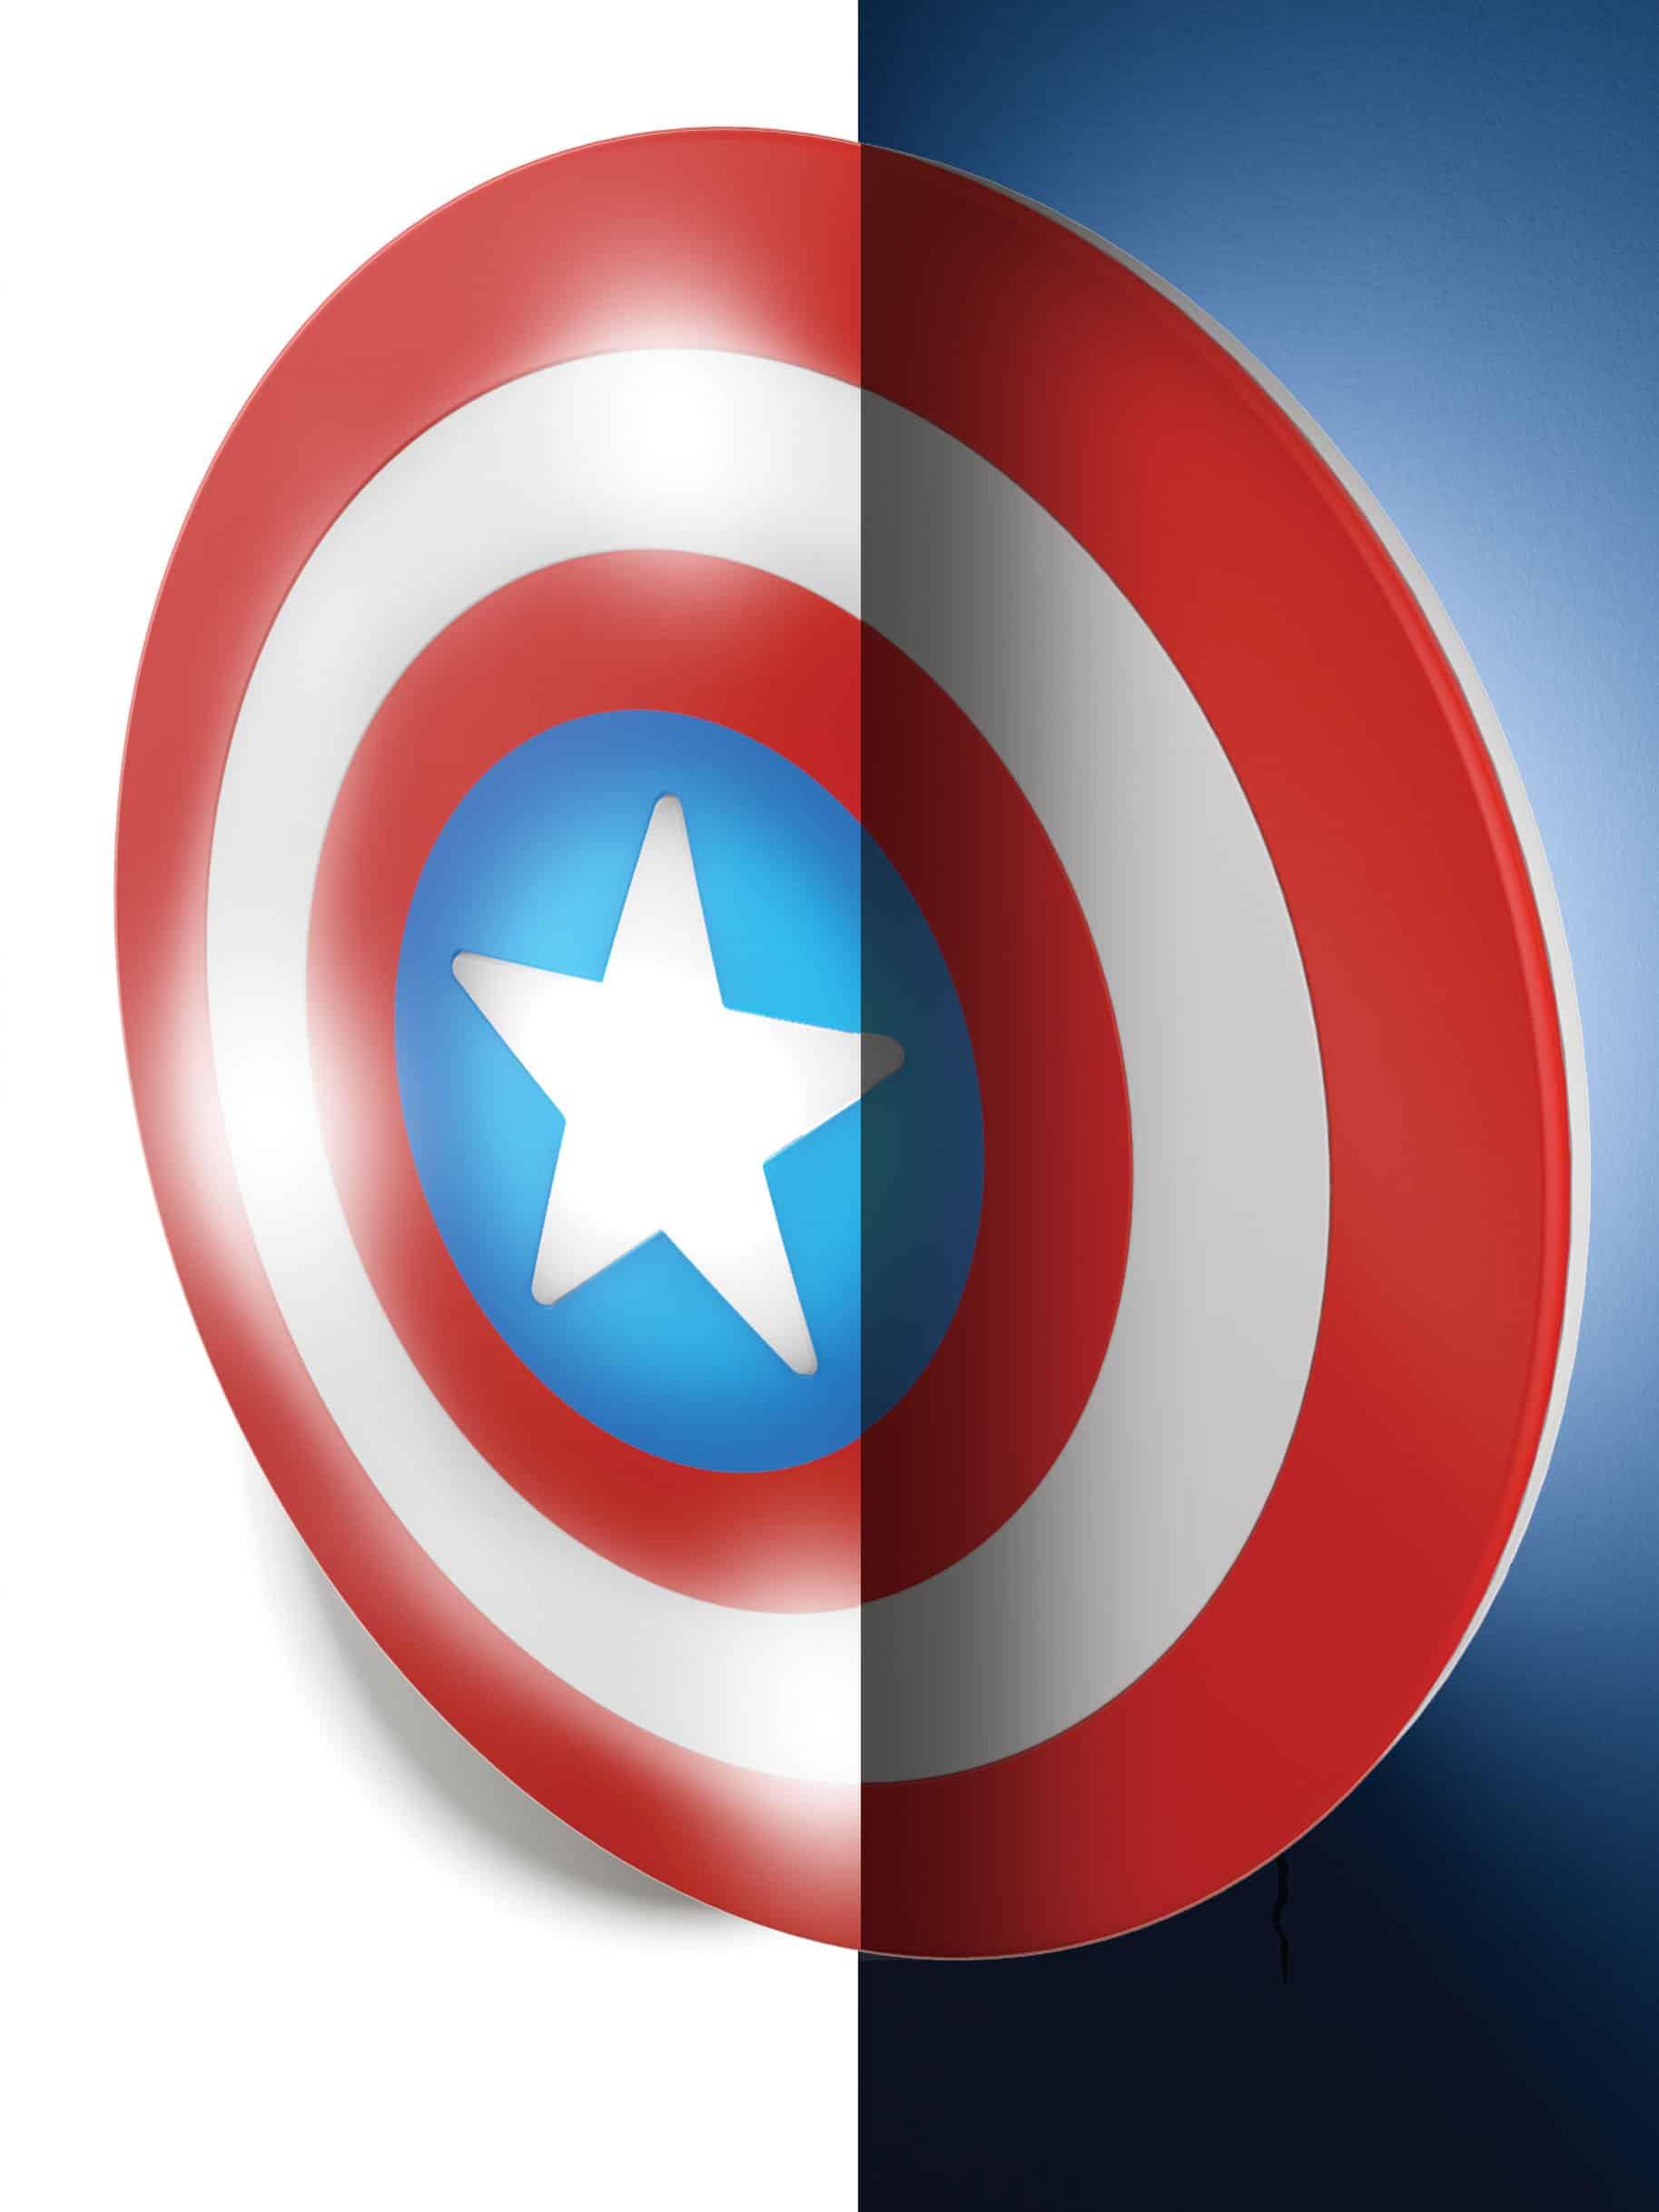 Lampe bouclier captain america marvel super insolite - Bouclier capitaine america ...